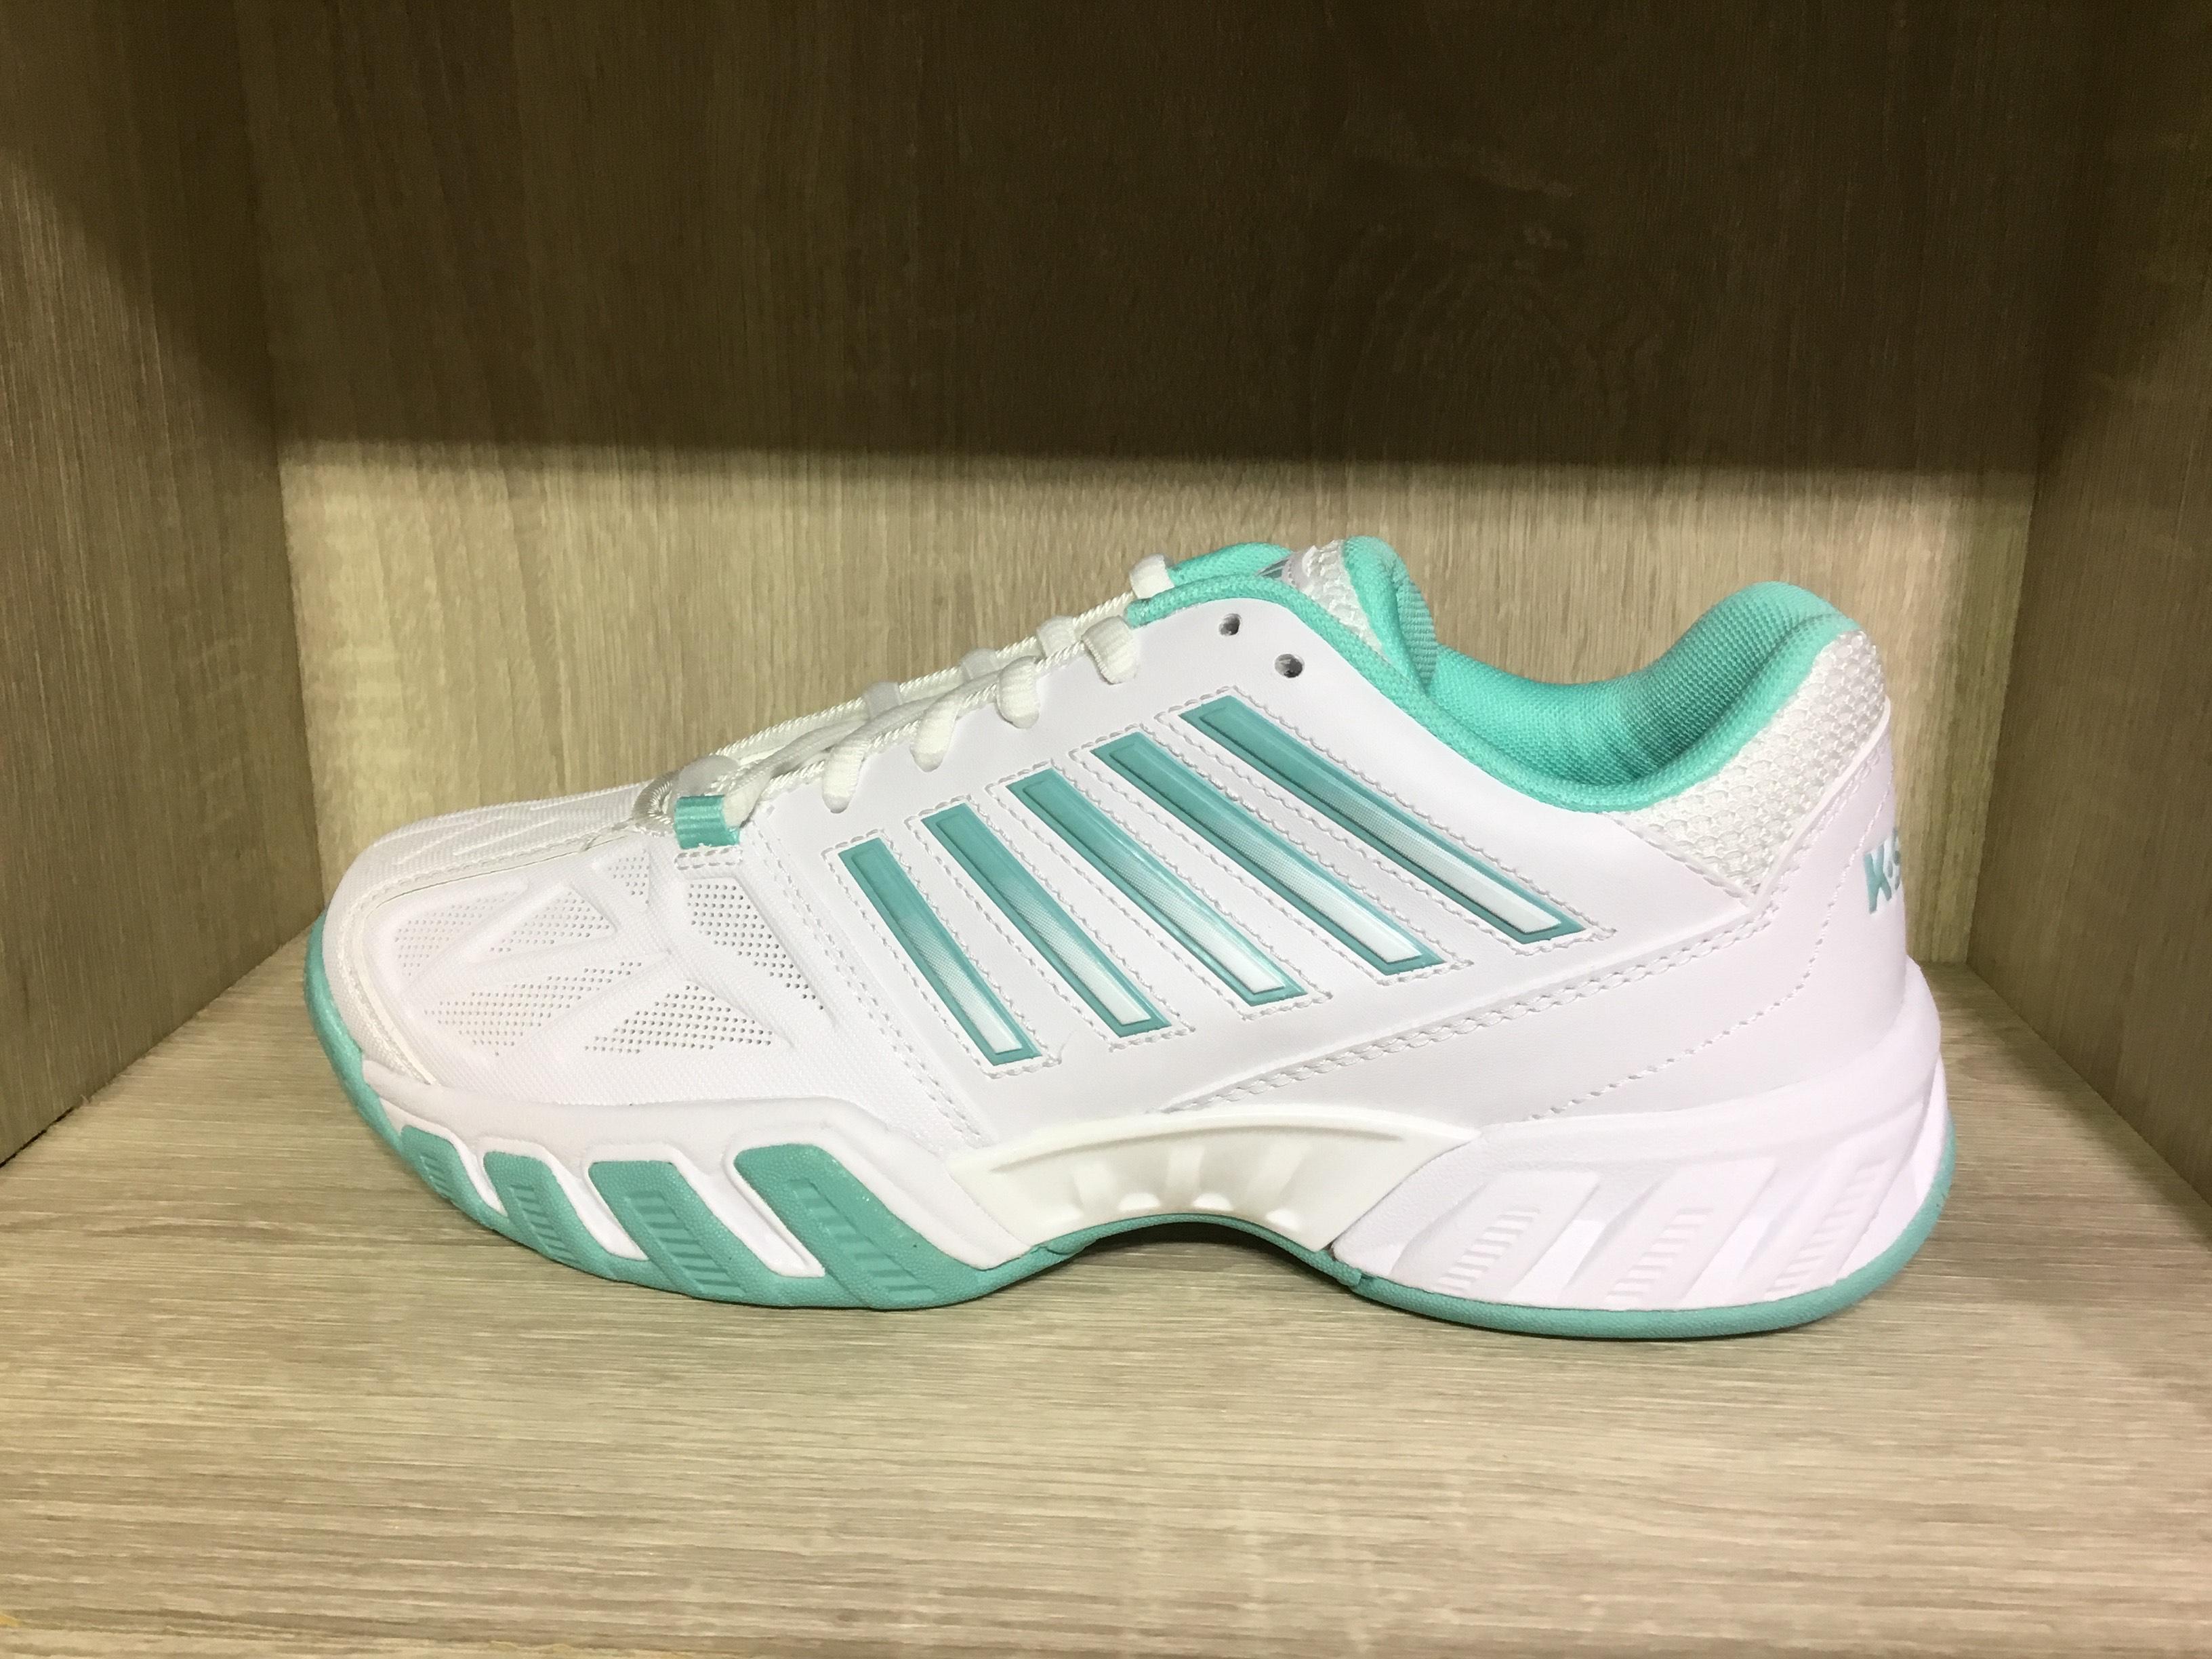 2020年K-SWISS Bigshot Light 3 專業女網球鞋